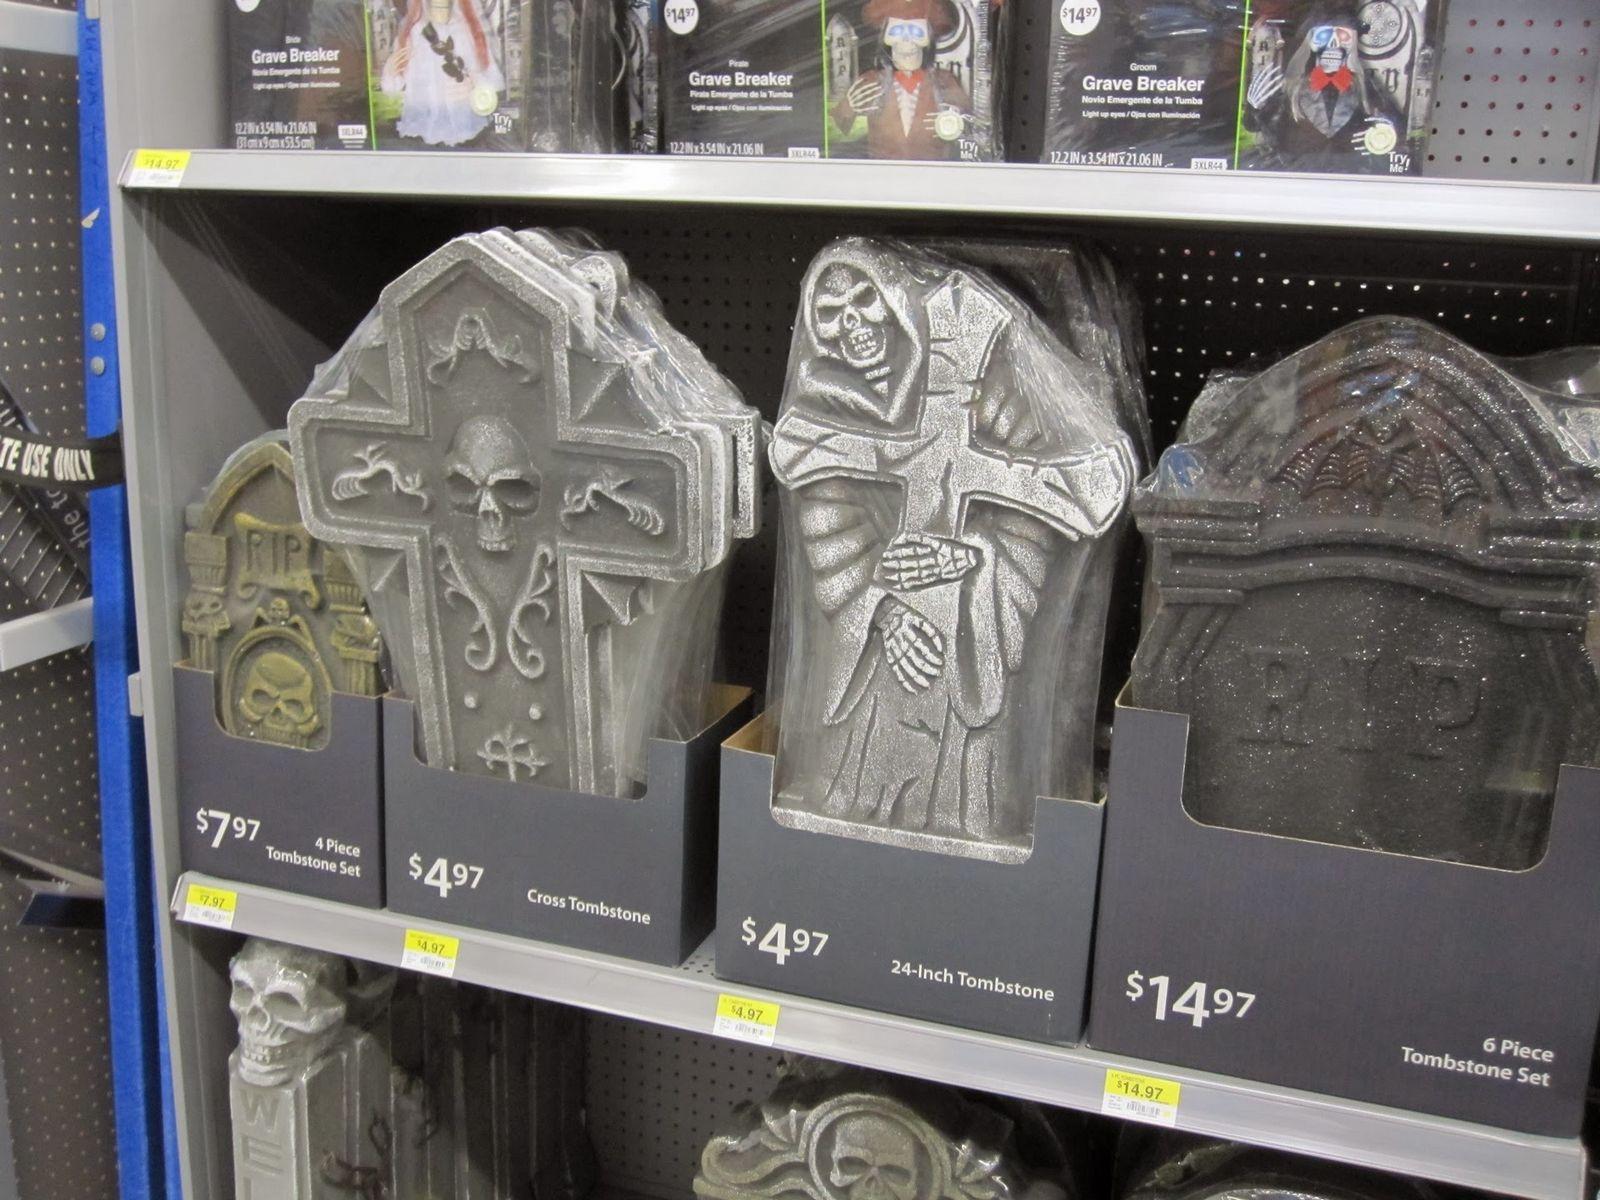 Halloween ya ha llegado al Walmart de Ellsworth